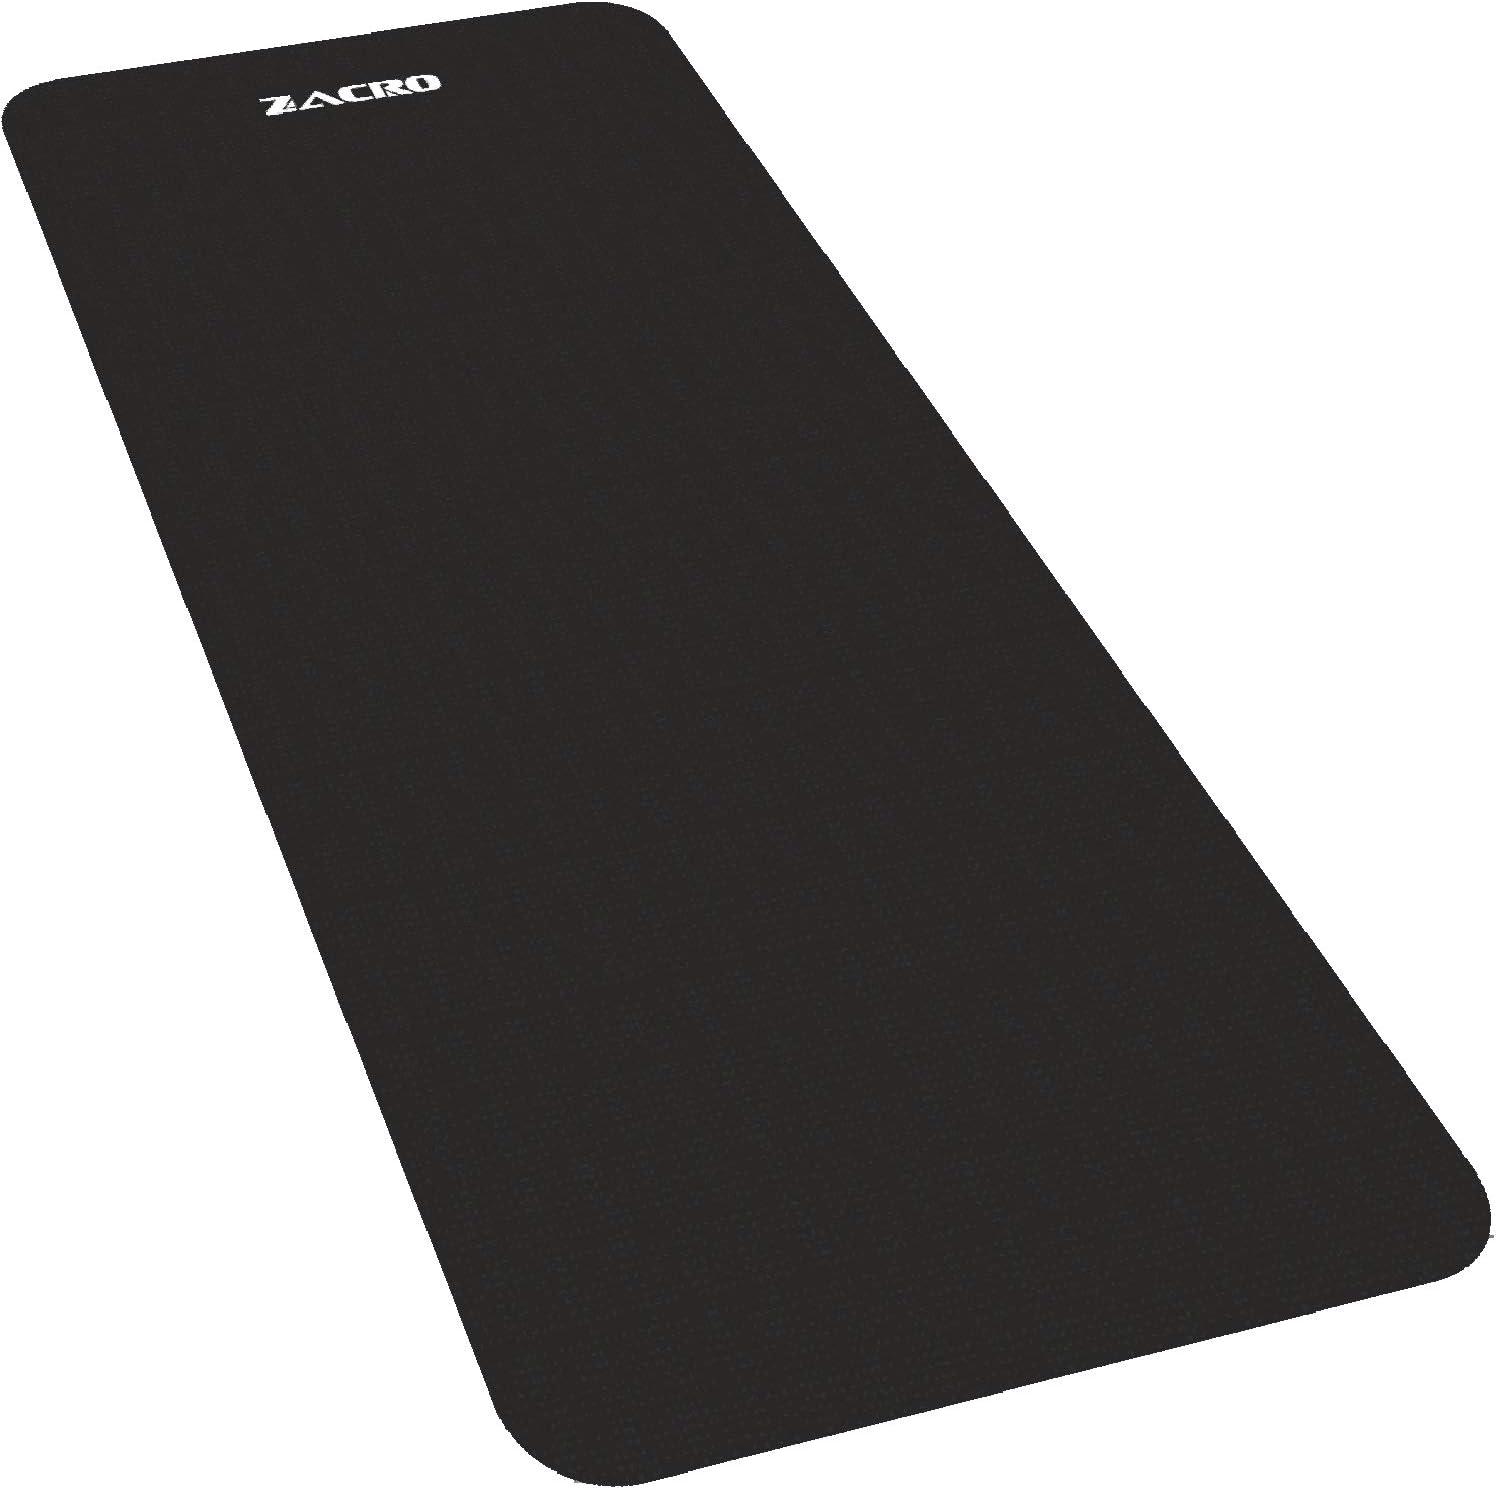 Zacro Protective exercise treadmill mat for carpet